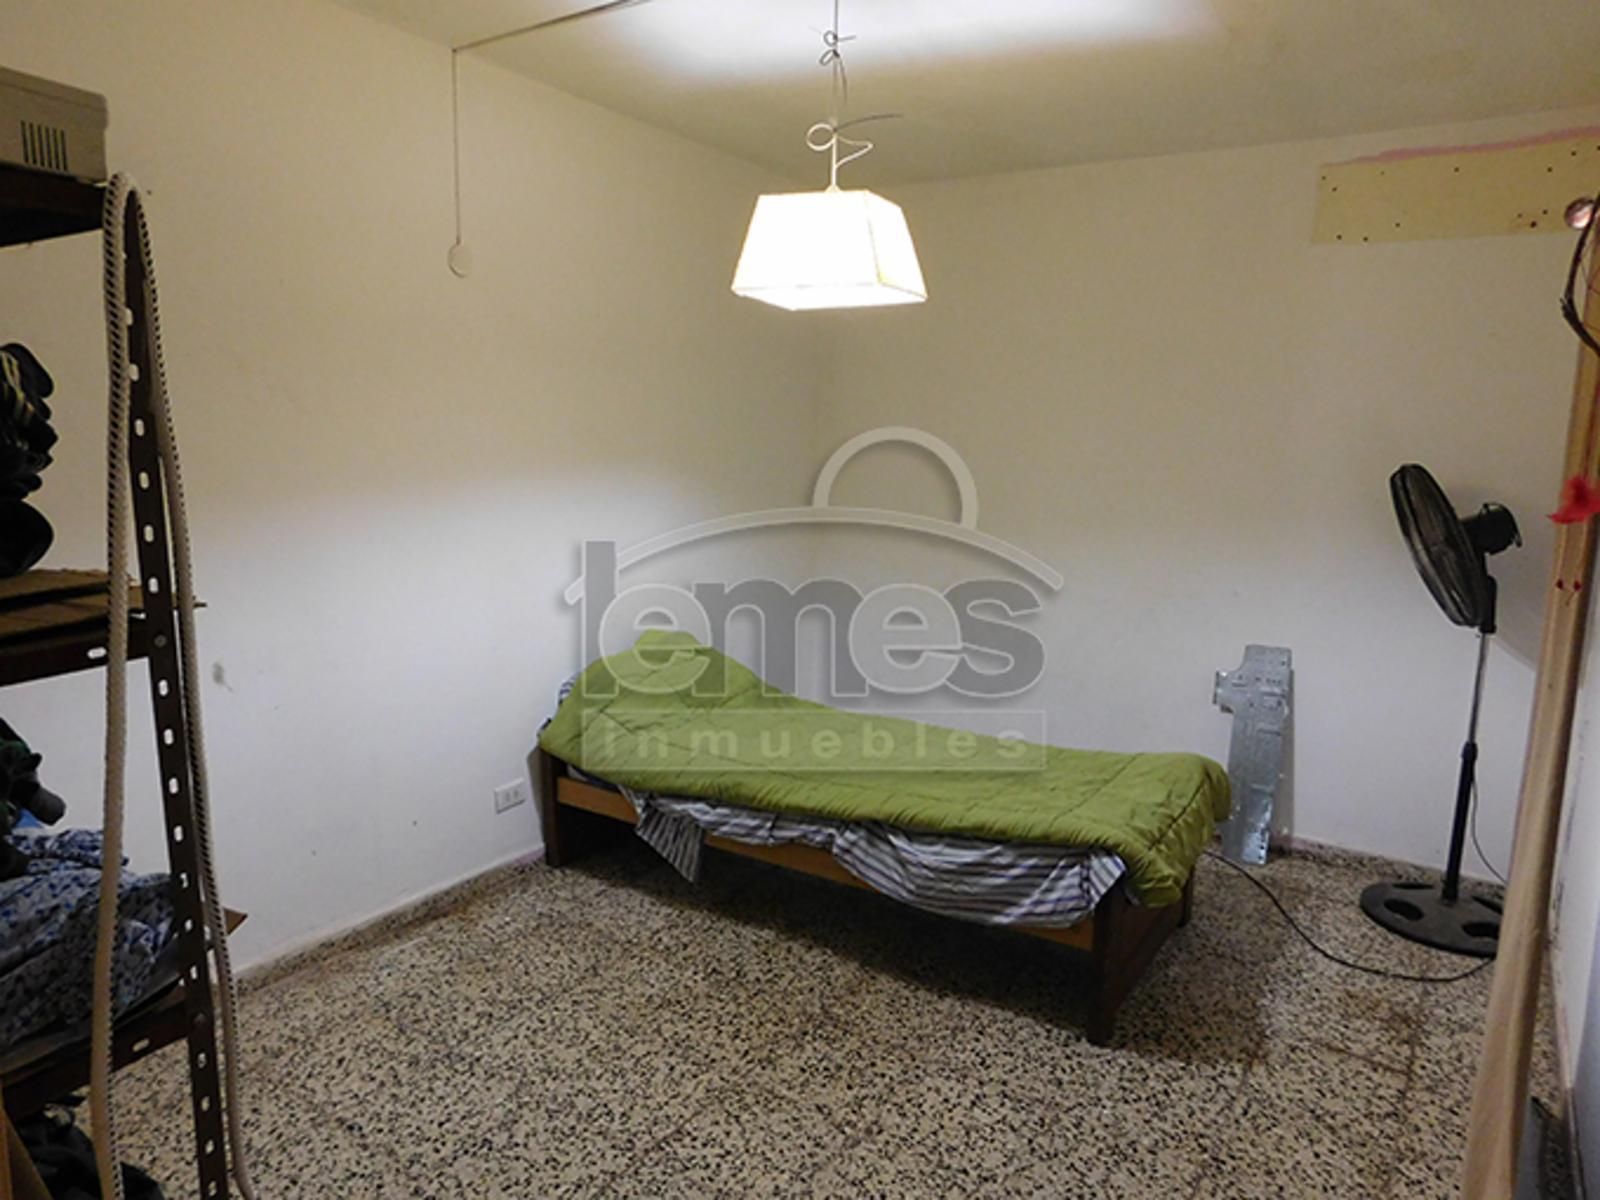 Casa s/Chacabuco - Zona Norte, Lemes Inmuebles